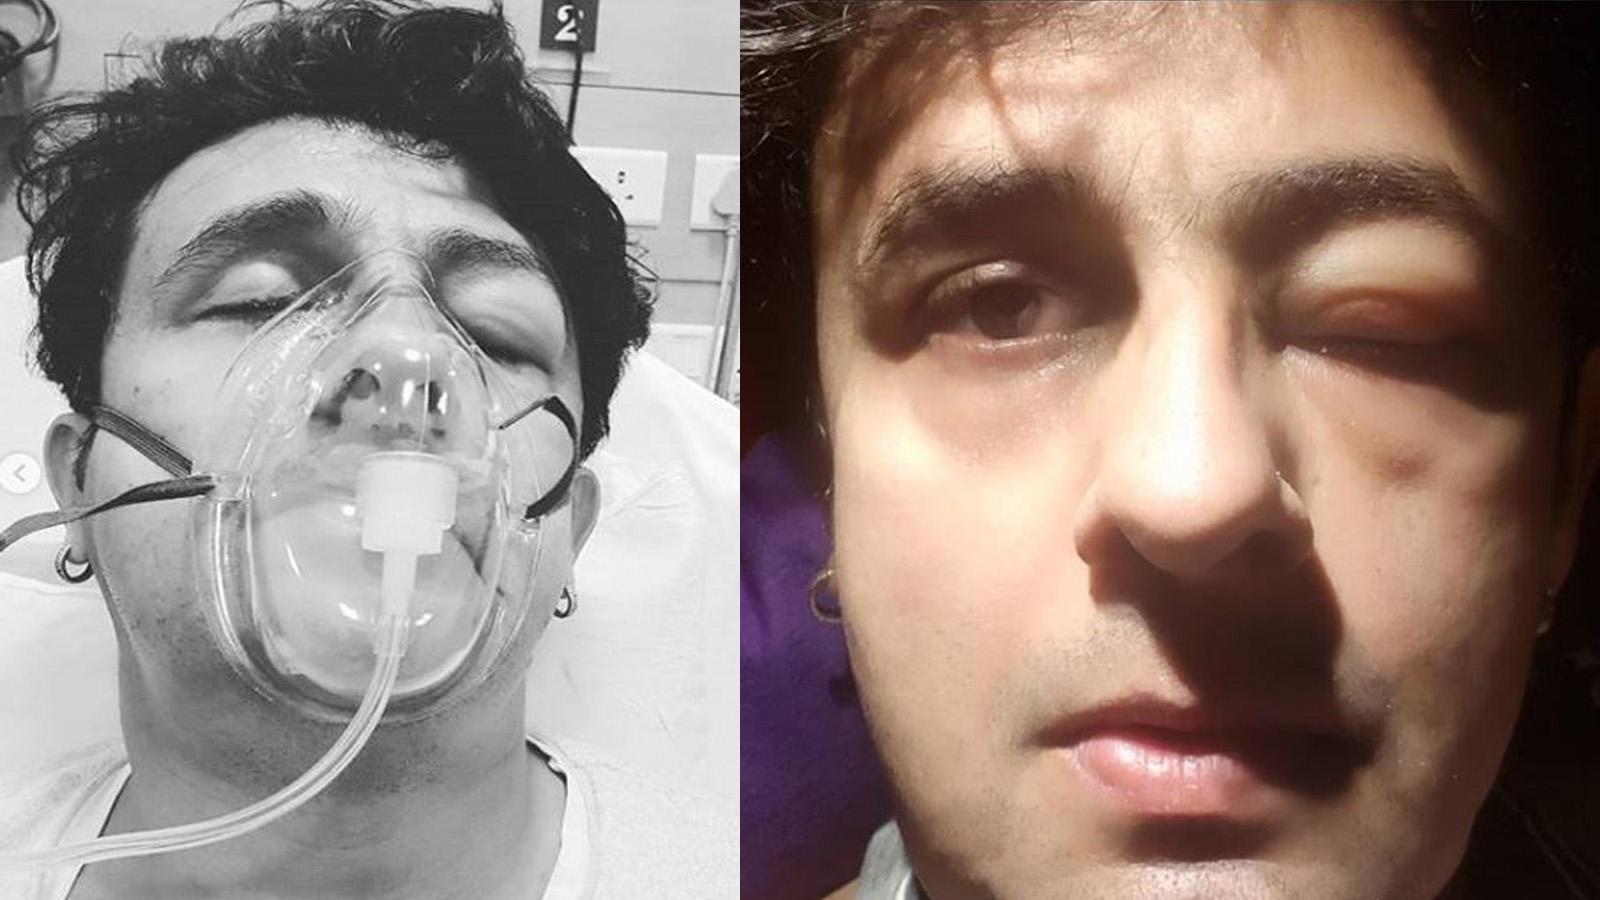 Sonu Nigam gets swollen eye, shares photograph on social media